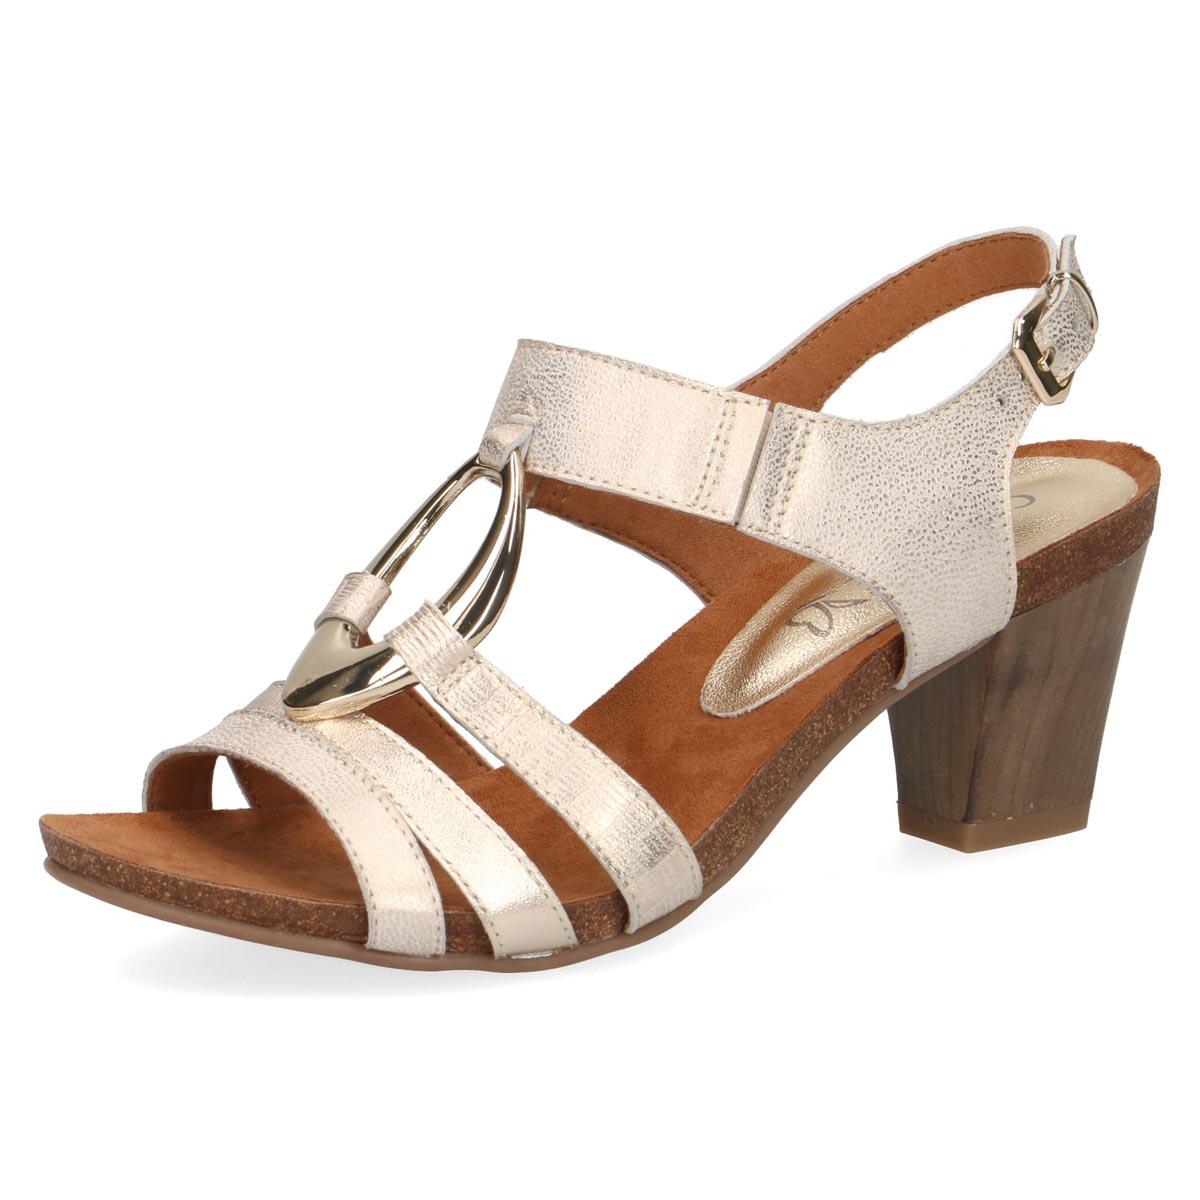 Verena - Caprice Gold Summer Sandal